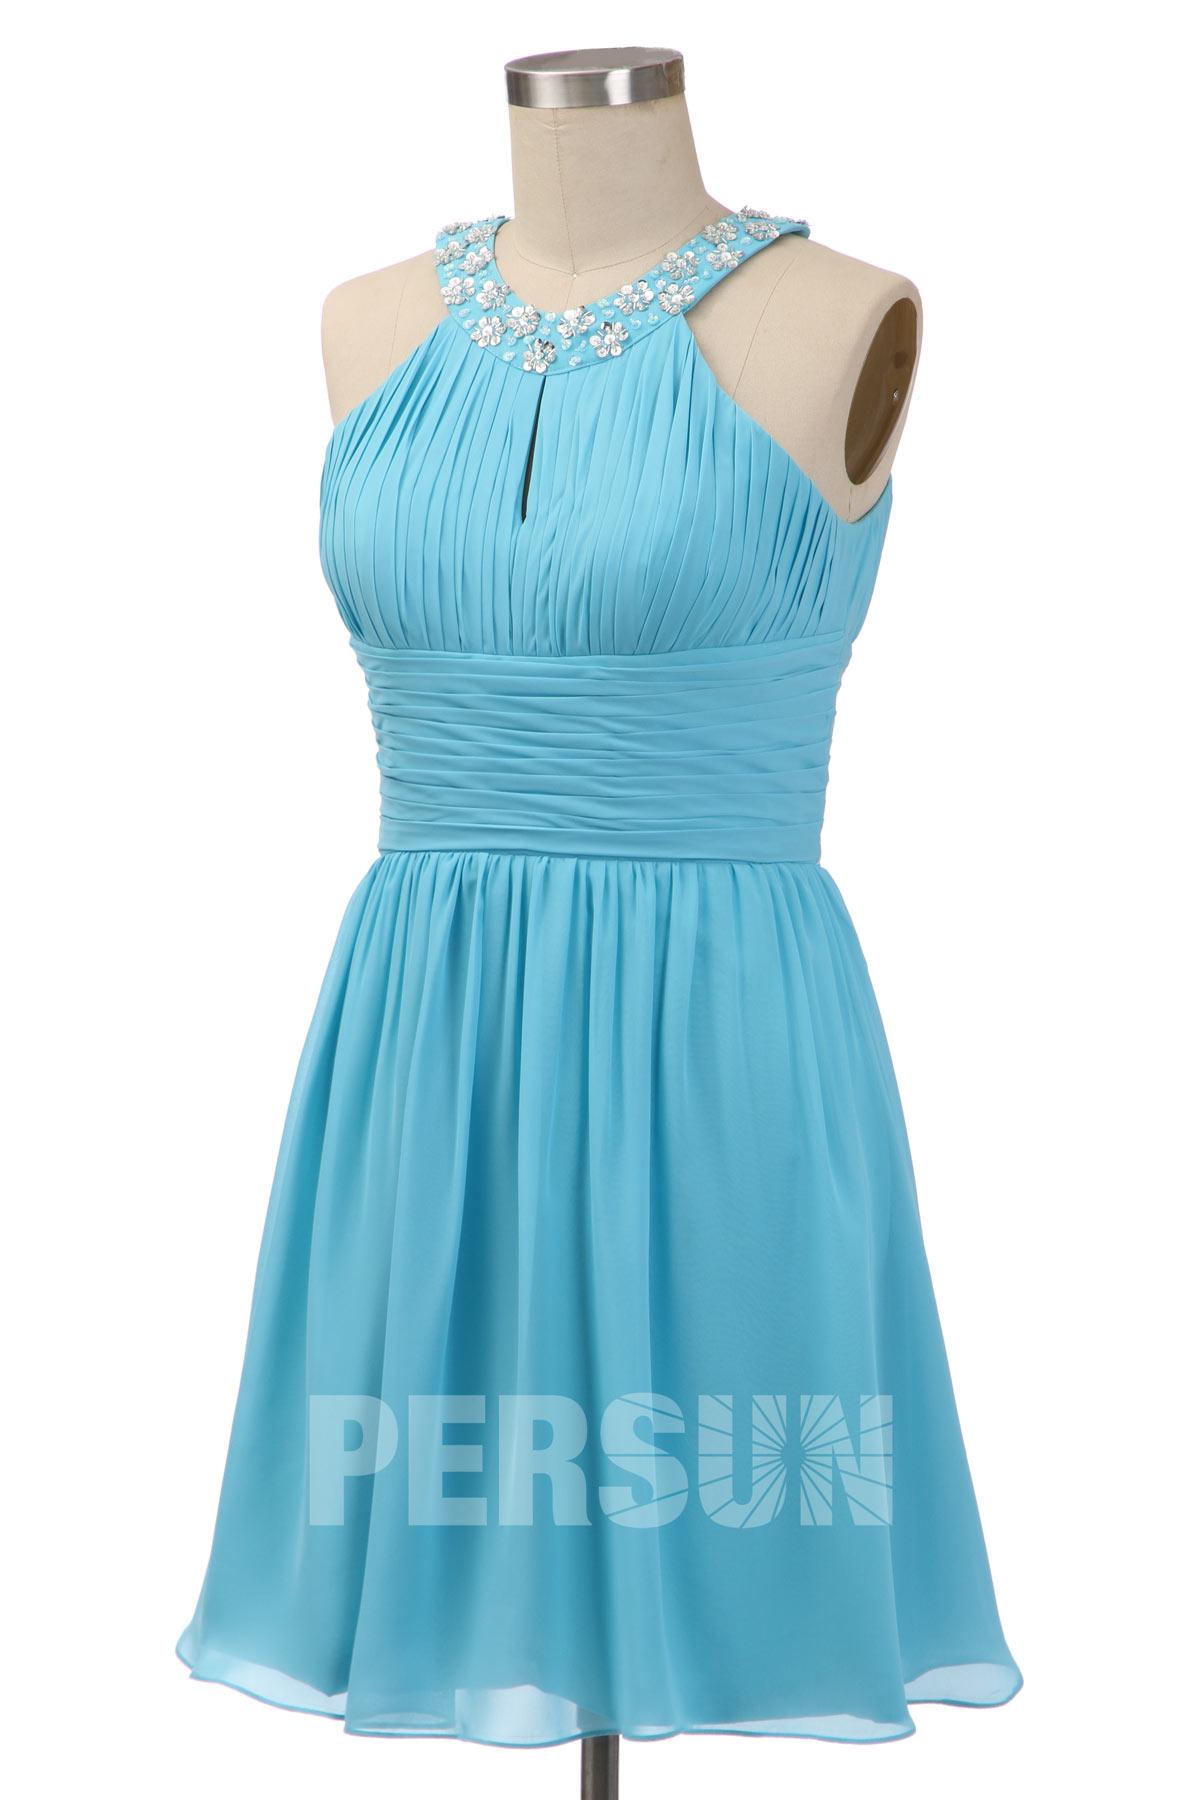 Soldes robe de cocktail bleu turquoise taille 44